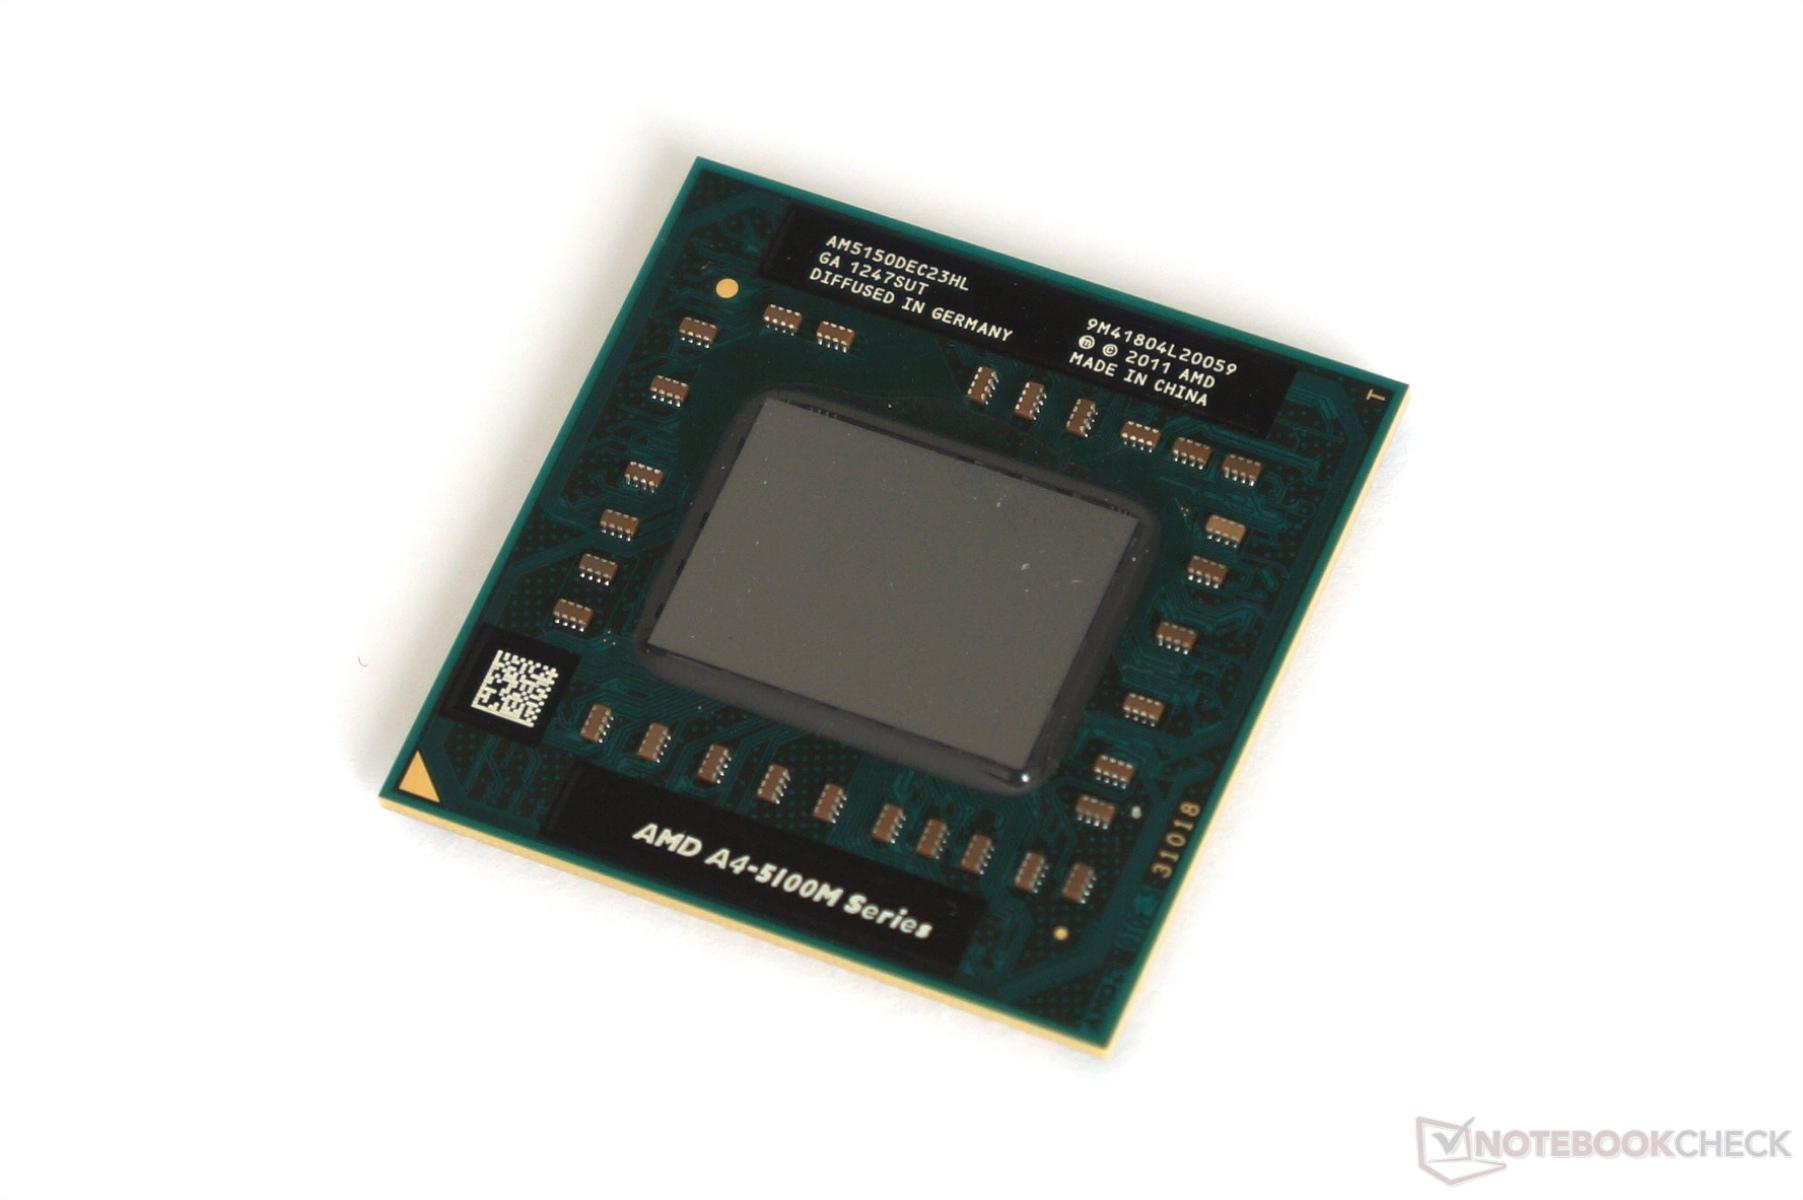 AMD A4-5150M APU DESKTOP PROCESSOR DRIVER FOR WINDOWS 7